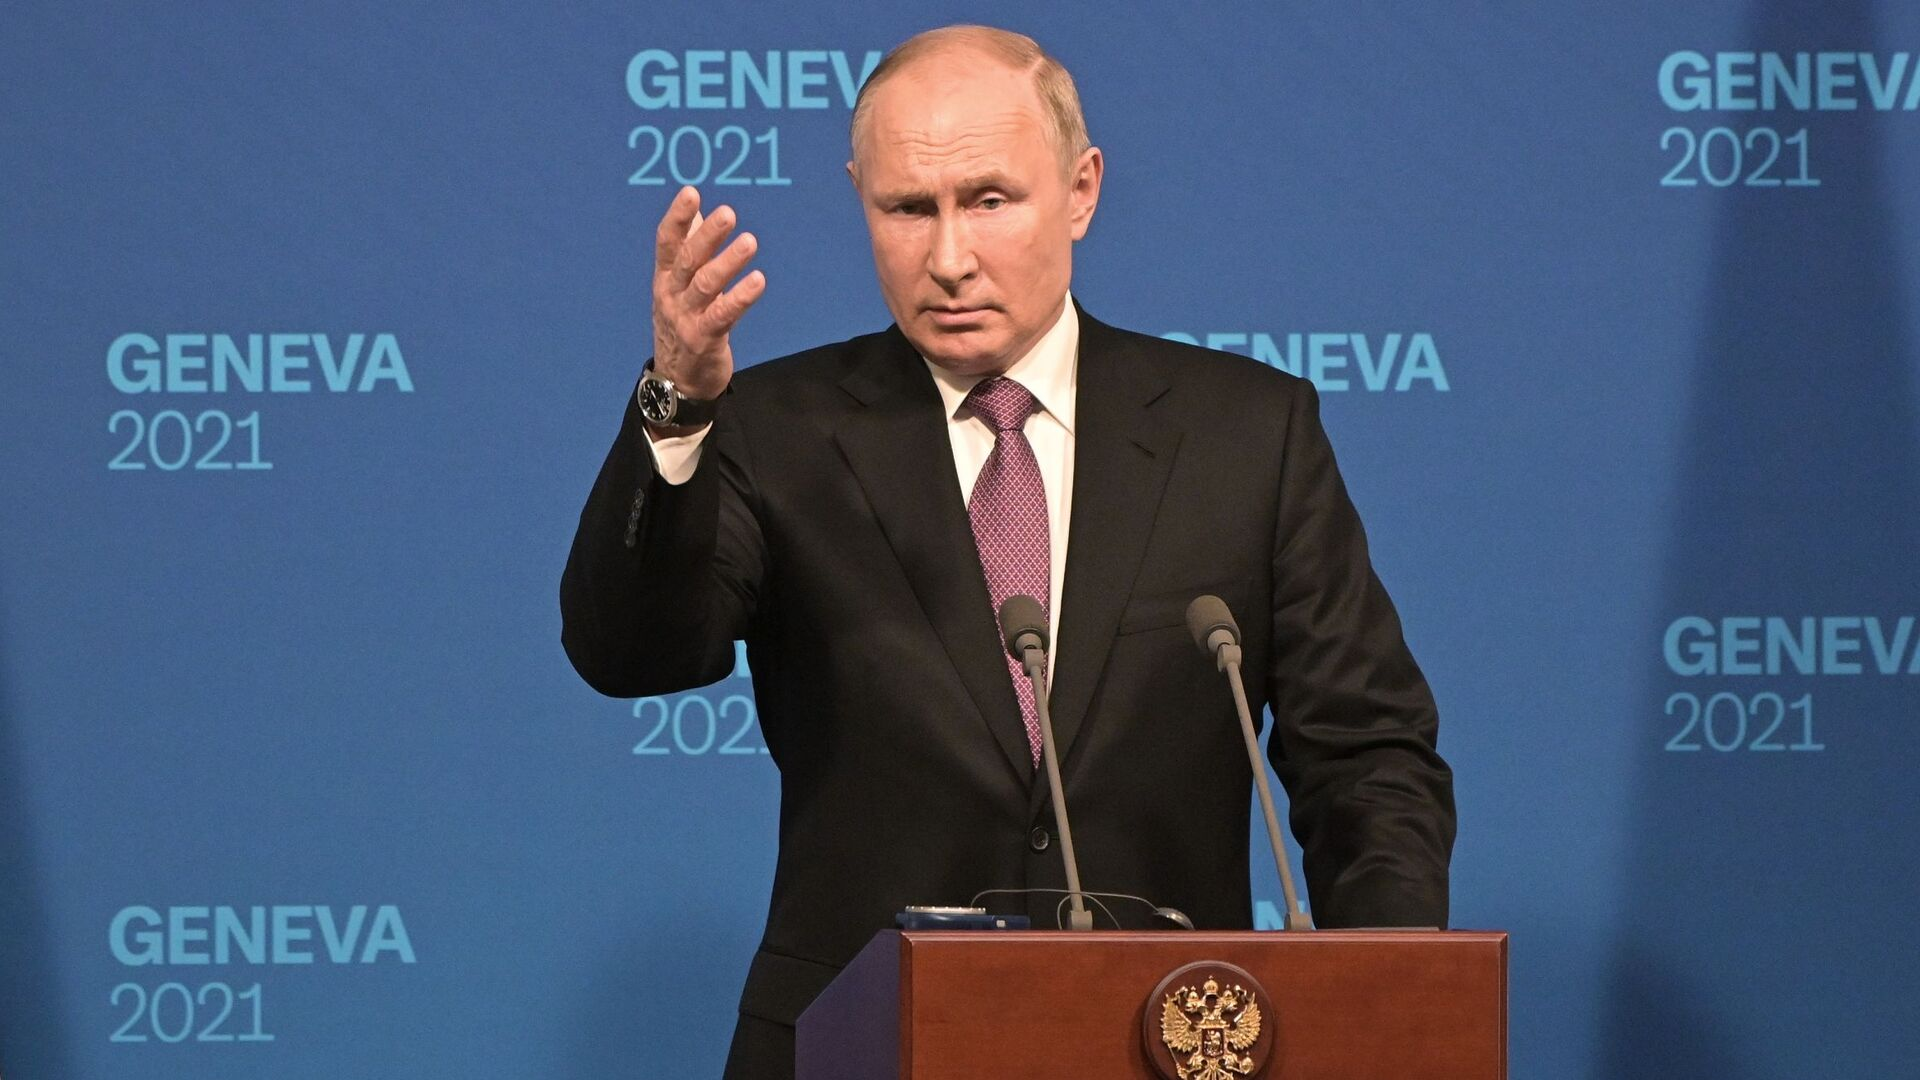 Президент РФ Владимир Путин на пресс-конференции - Sputnik Грузия, 1920, 09.09.2021